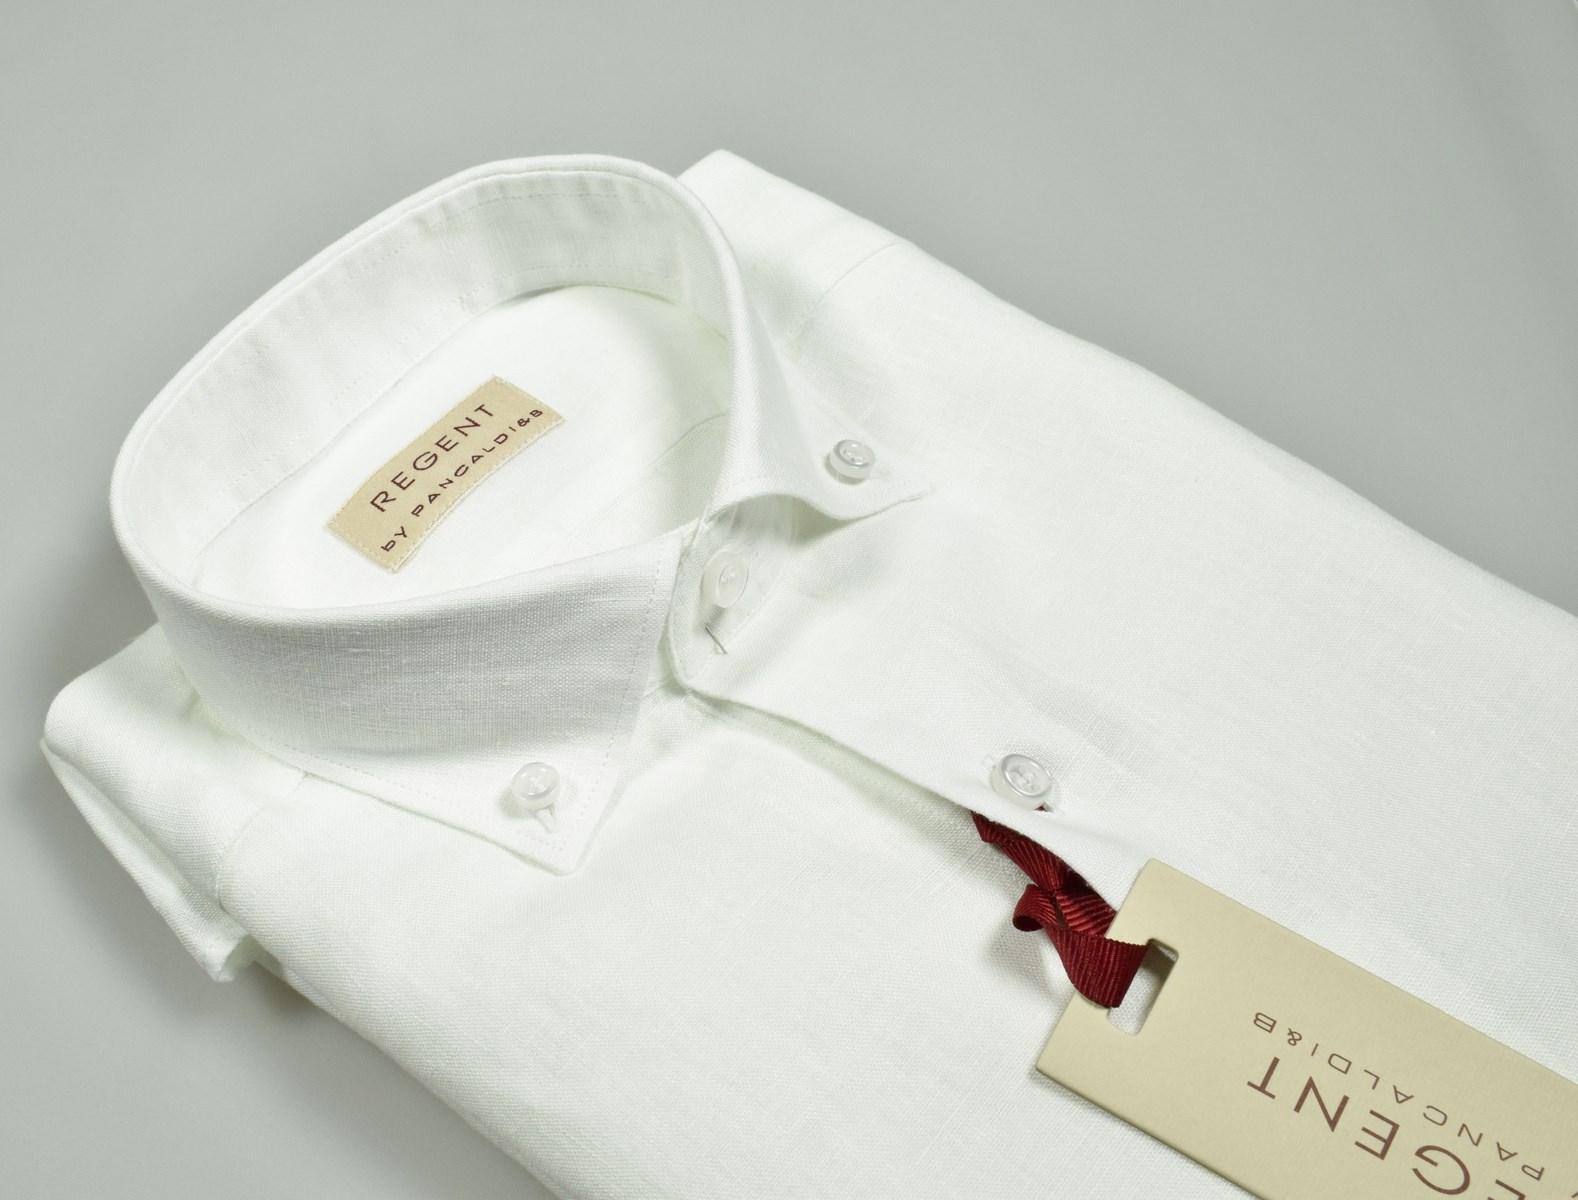 fa4aed3940 Men's fashion shirts in pure white linen regent by pancaldi online shop